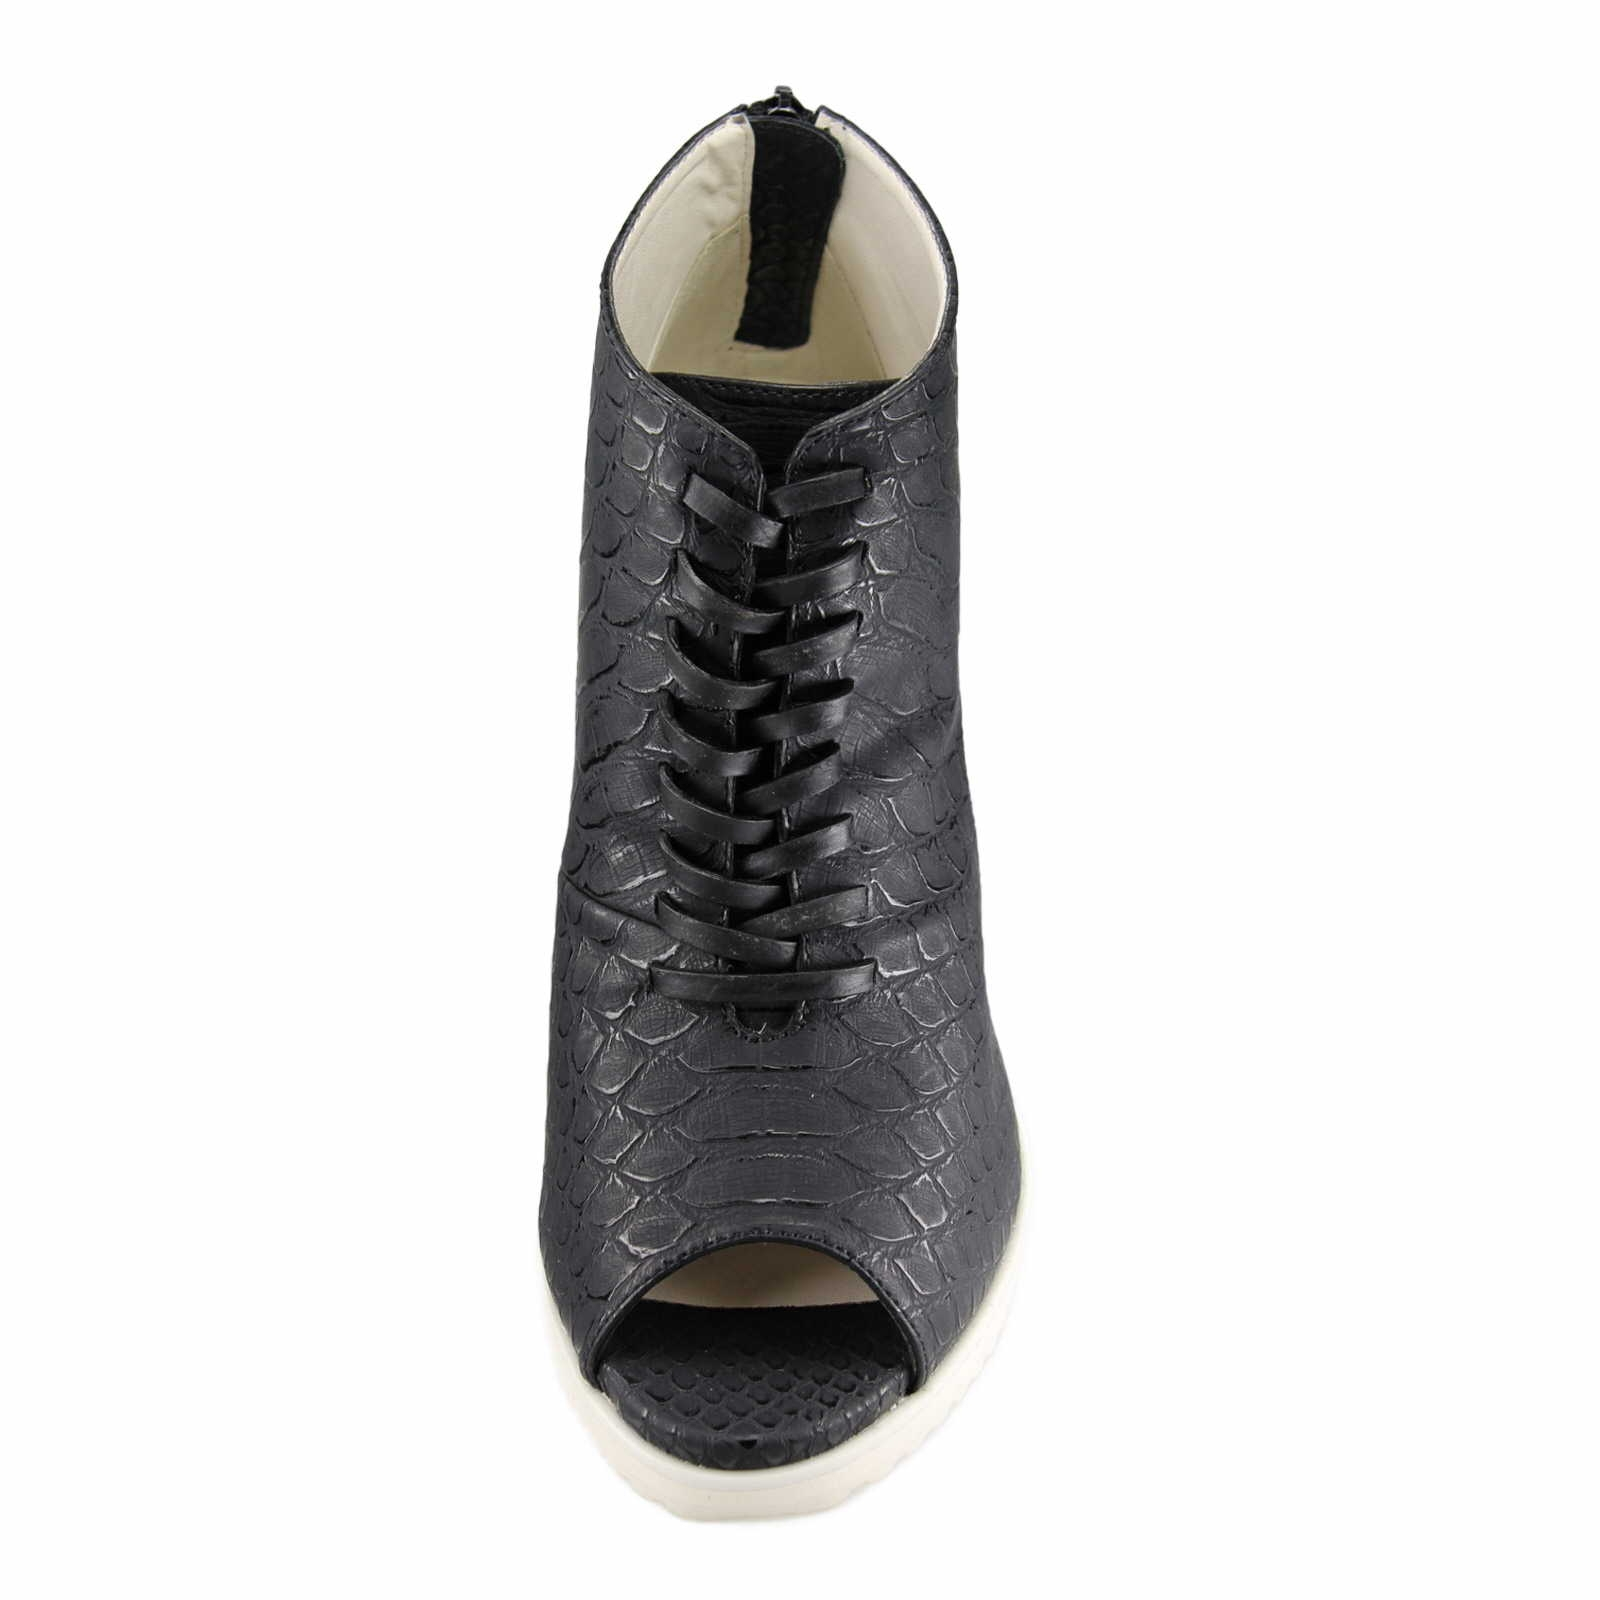 gerry weber shoes schwarz adriana 02 g26802 832 100. Black Bedroom Furniture Sets. Home Design Ideas